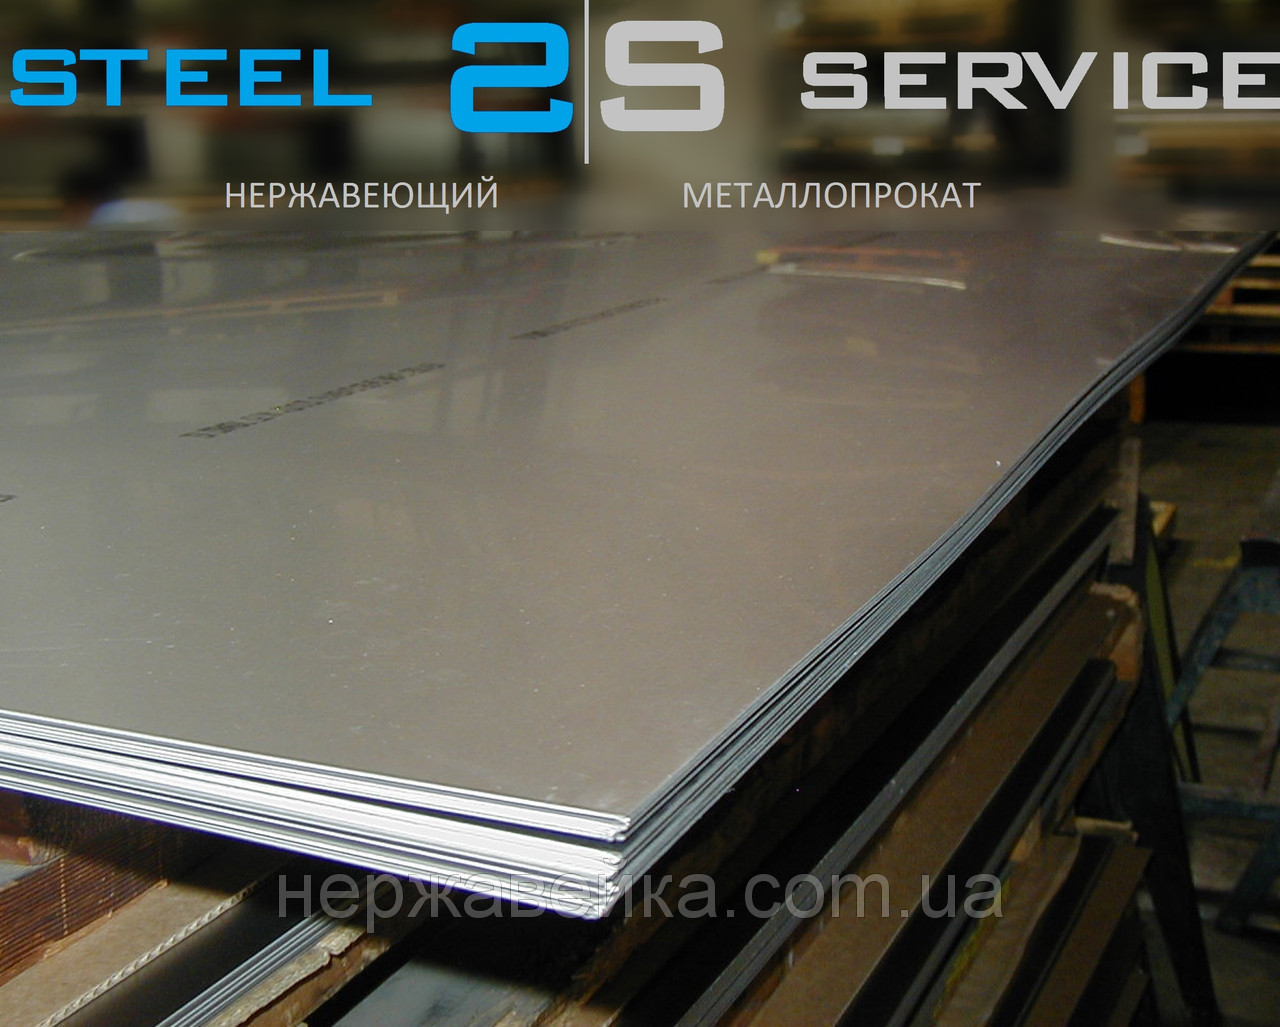 Нержавеющий лист 1х1000х2000мм  AISI 316Ti(10Х17Н13М2Т) 4N - шлифованный,  кислотостойкий